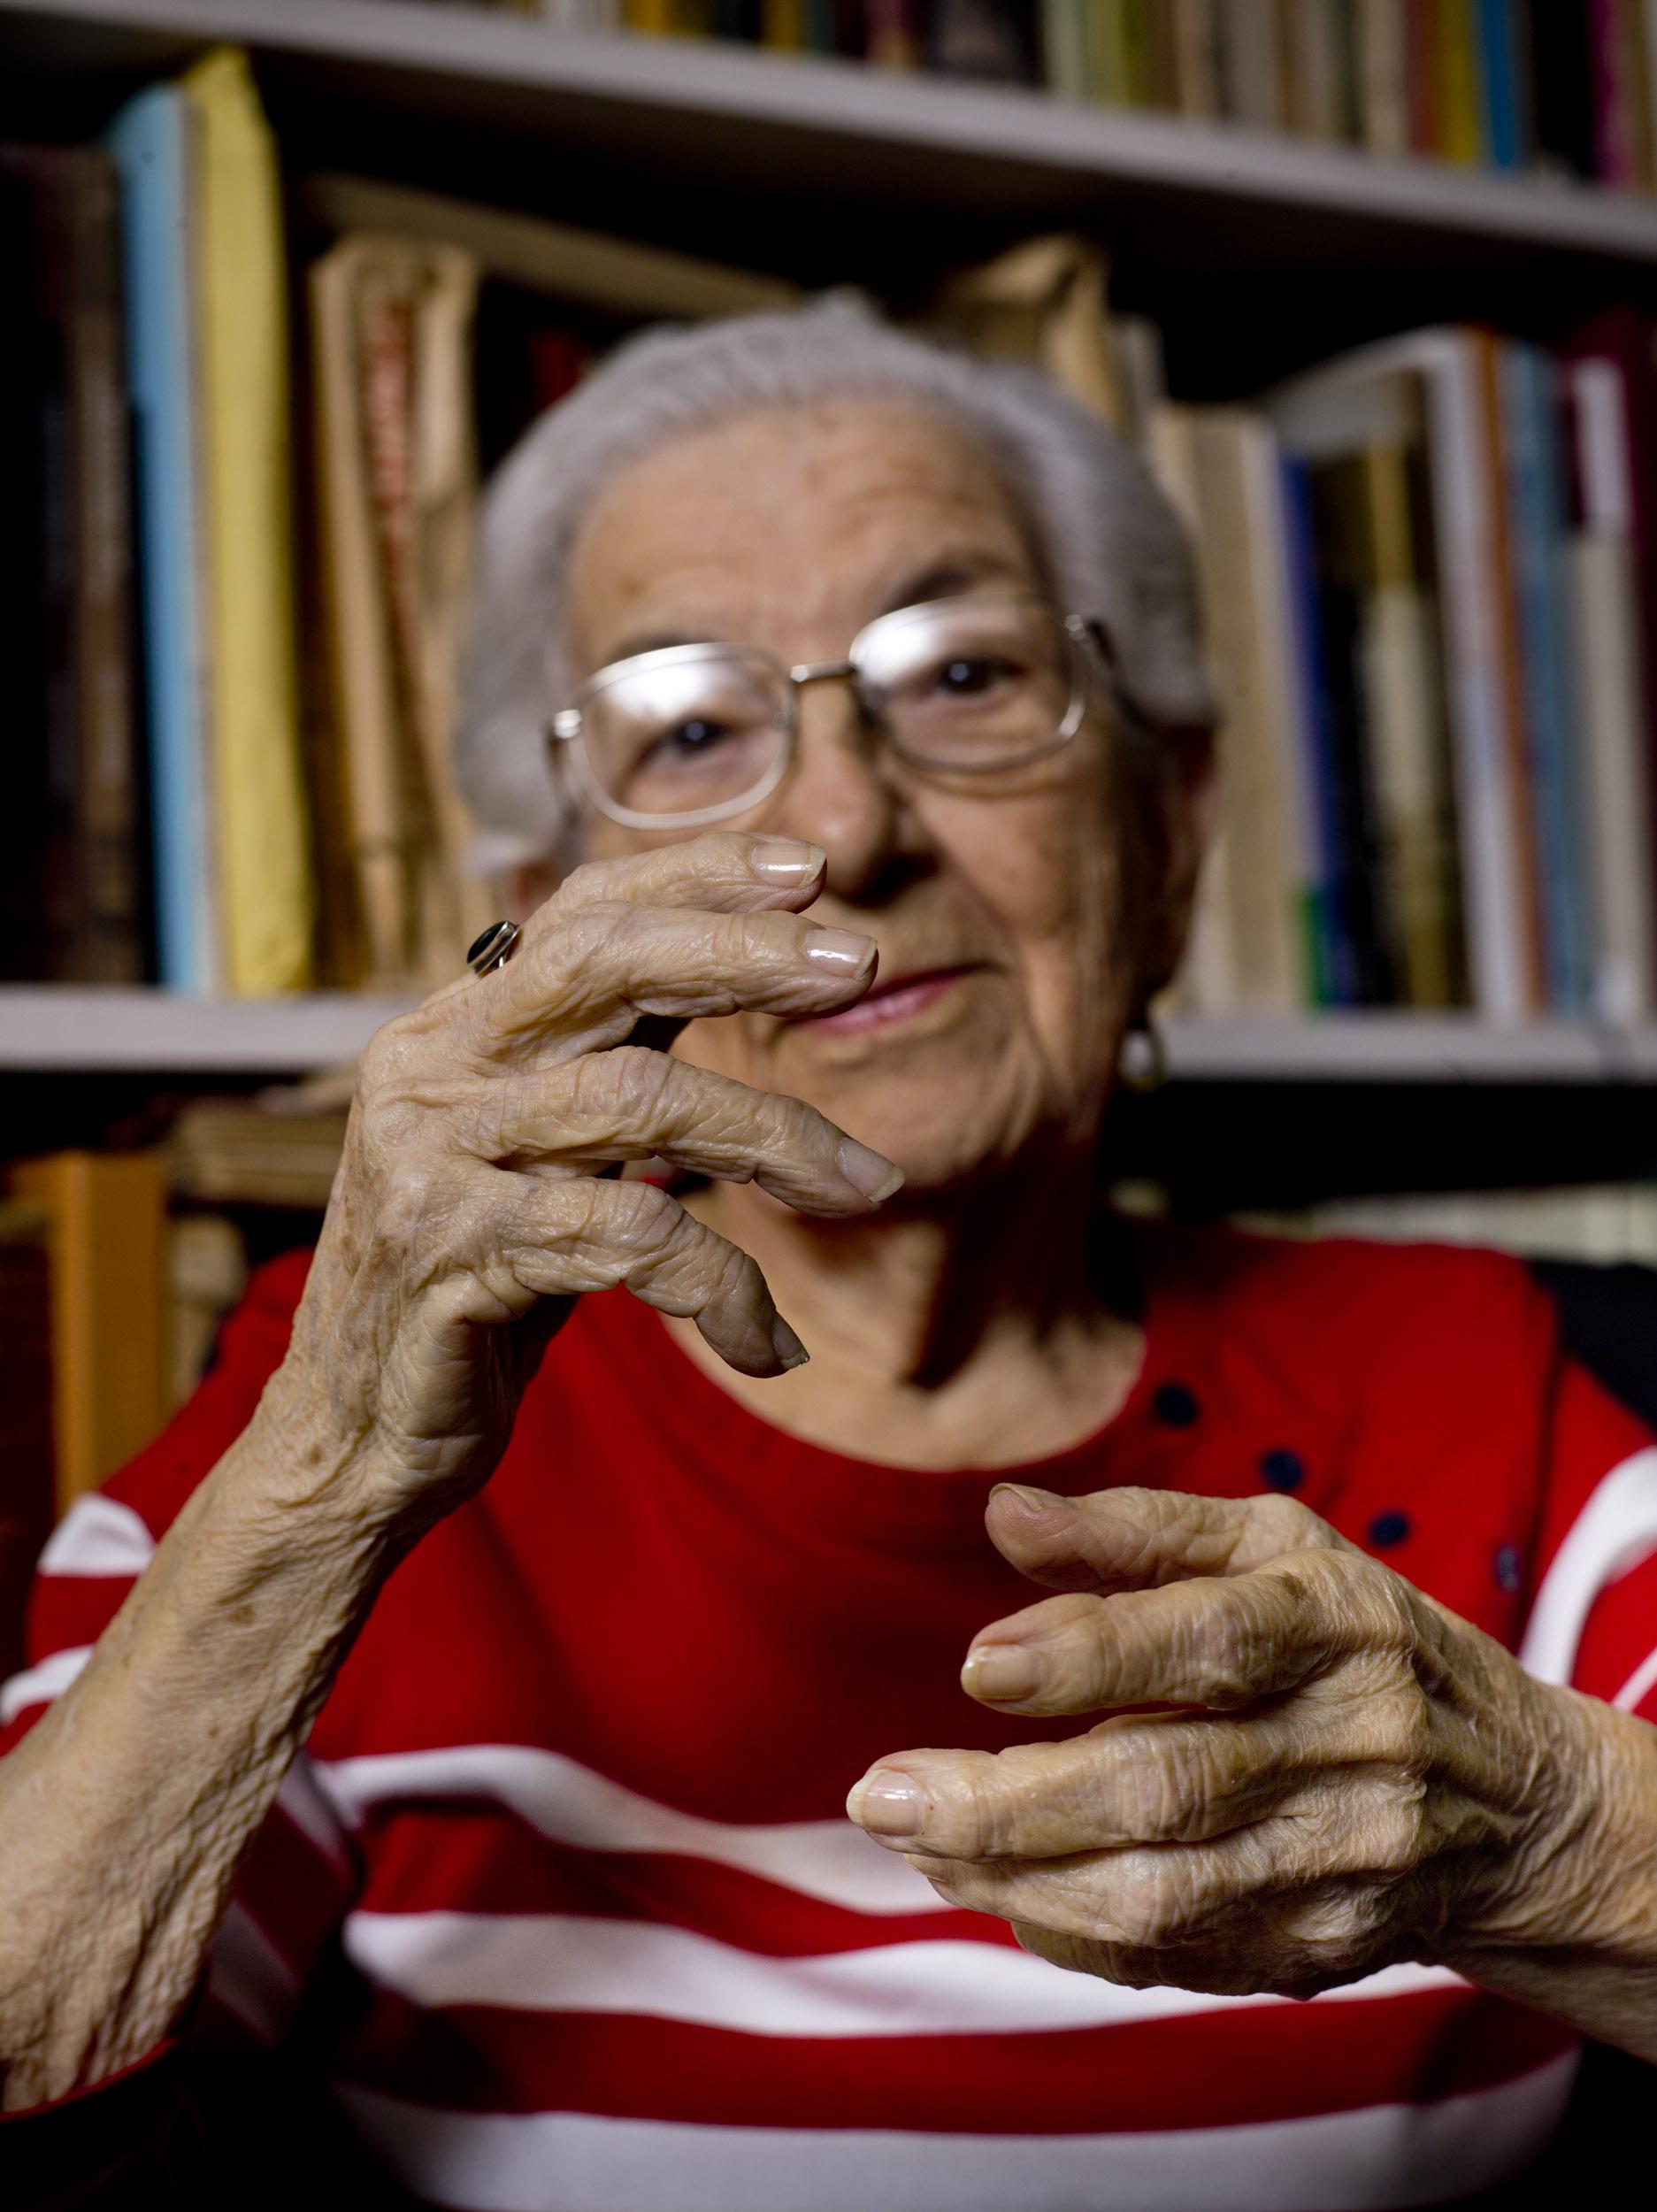 María teresa Linares, musicology - Illuminated Cuba - Hector Garrido, Aerial and human photography